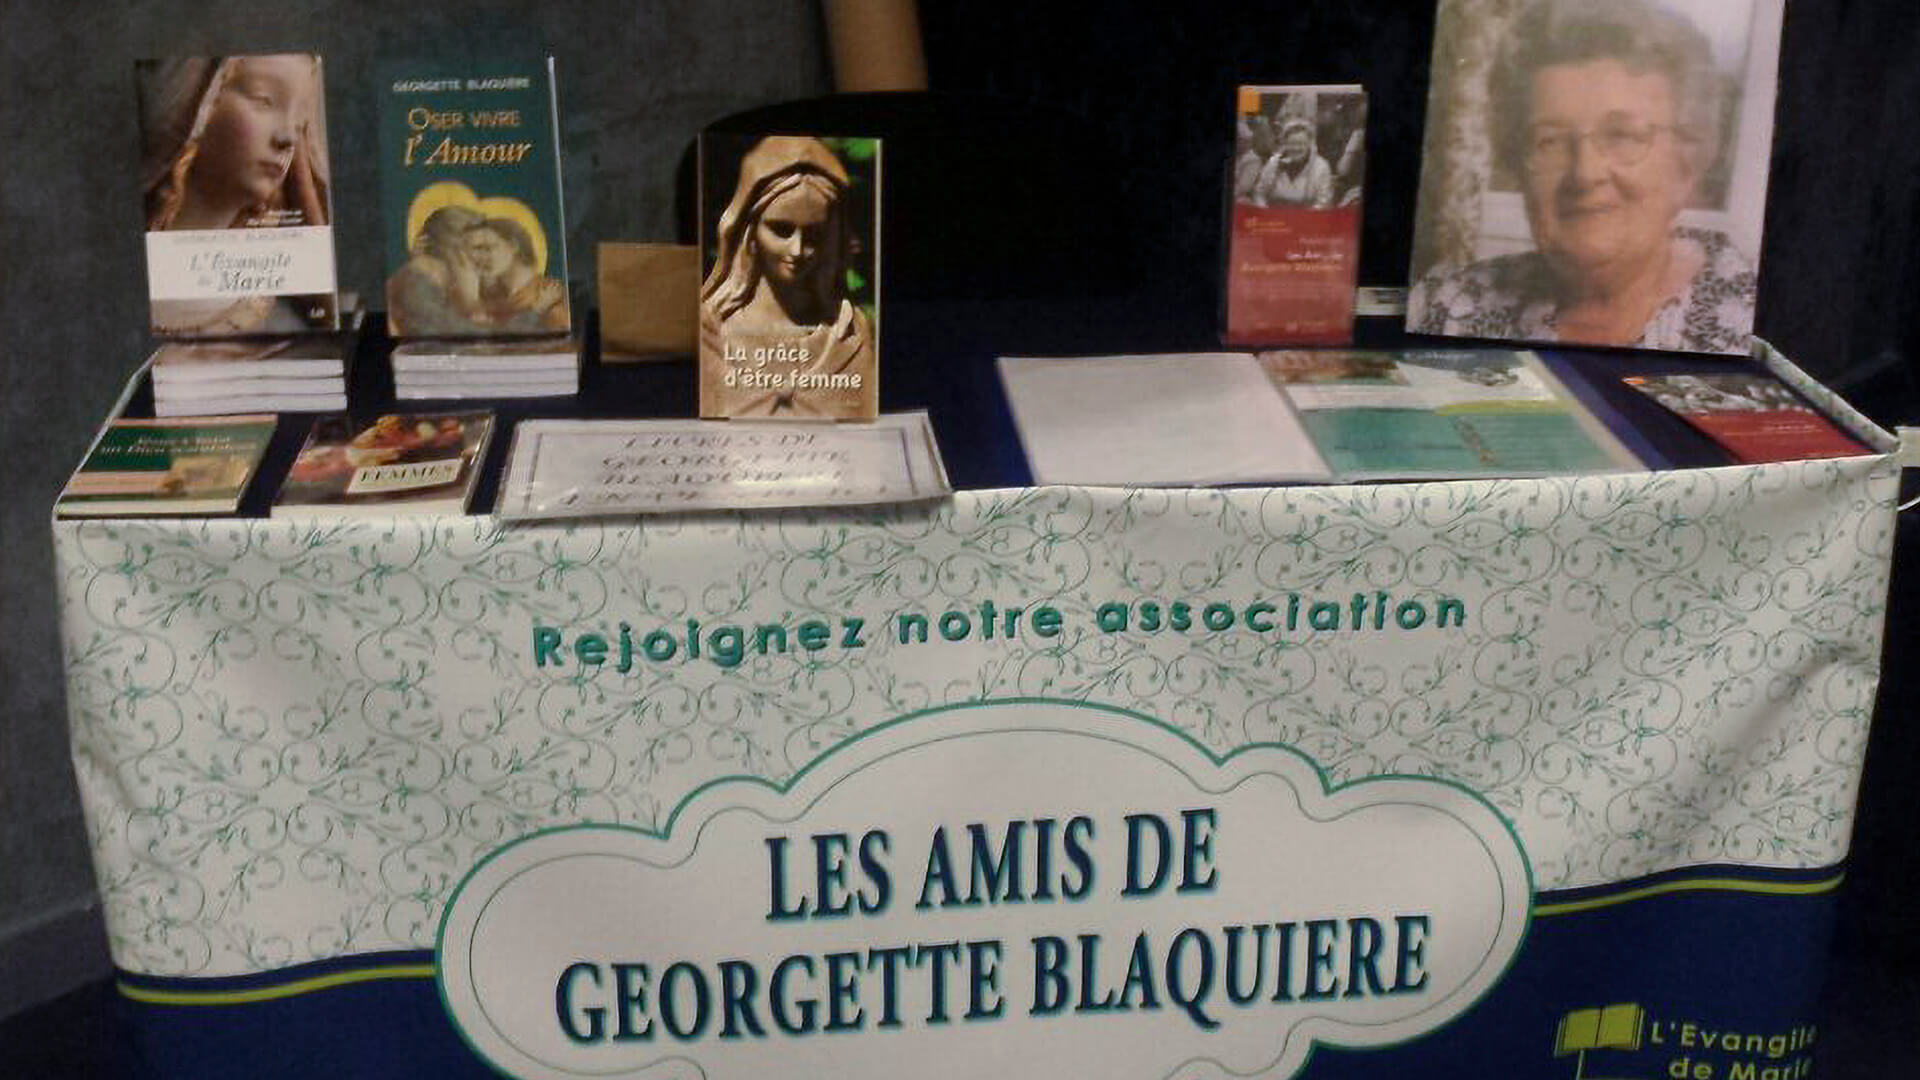 Georgette Blaquière